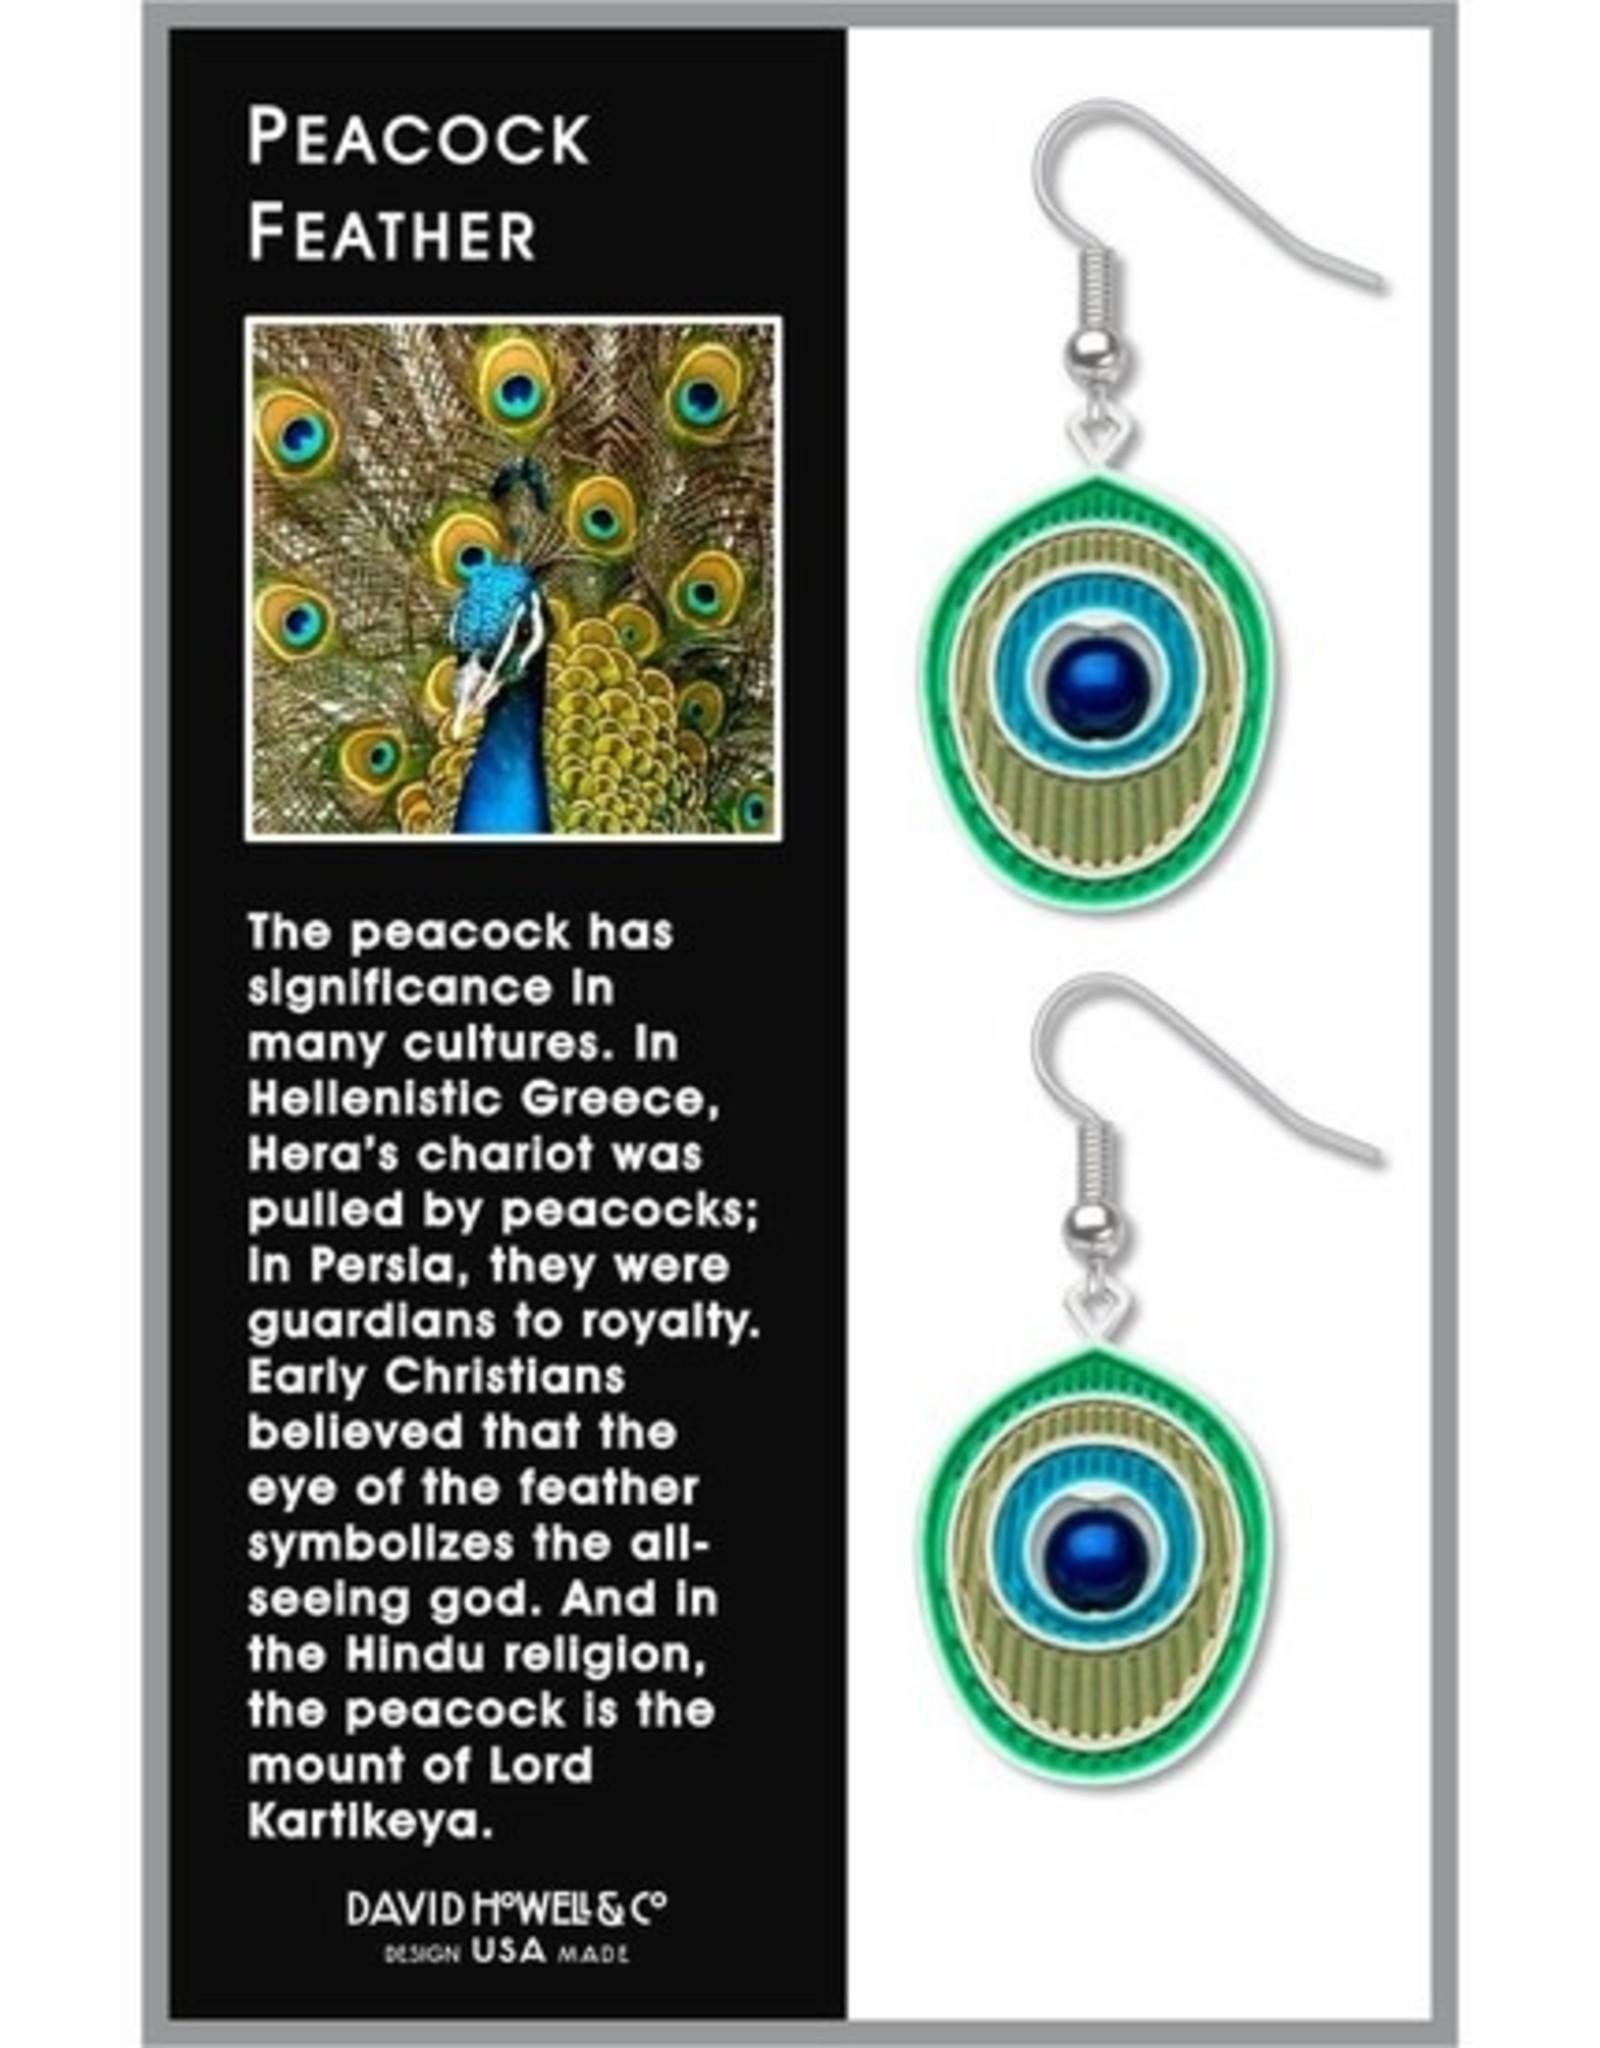 David Howell & Company Peacock Feather